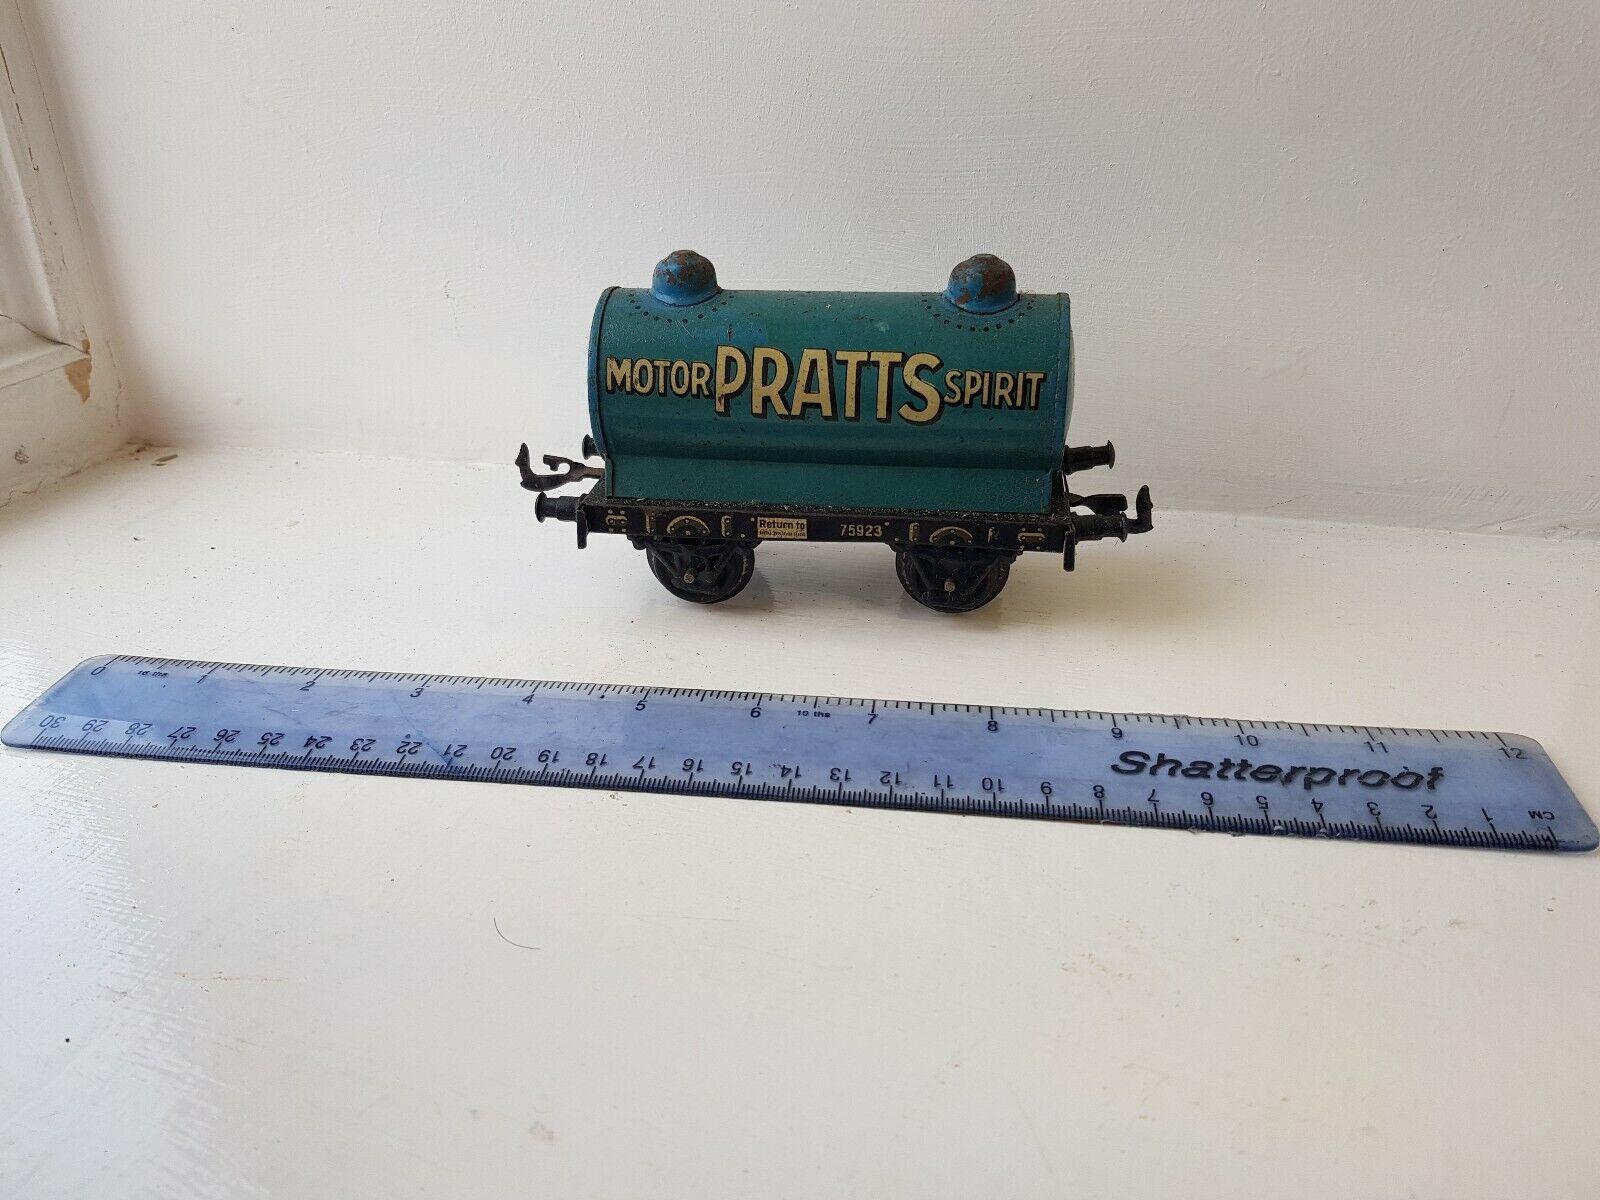 Bing 0 Gage Pratts Oil Tank Wagon obloxed